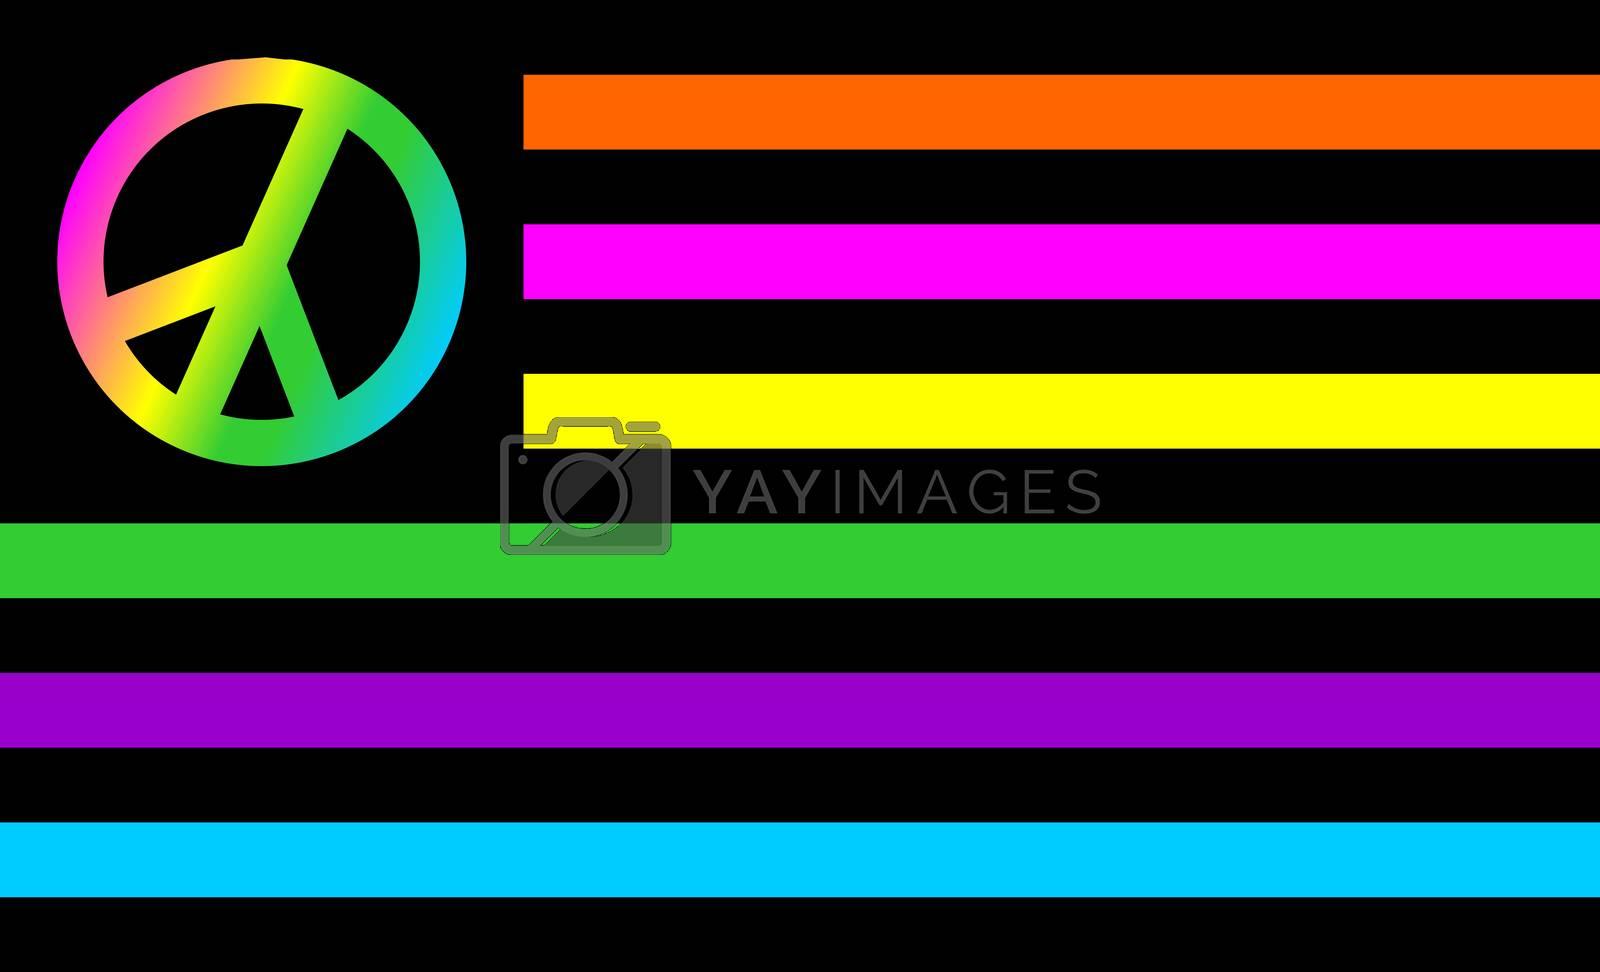 Royalty free image of usa peace flag by tony4urban